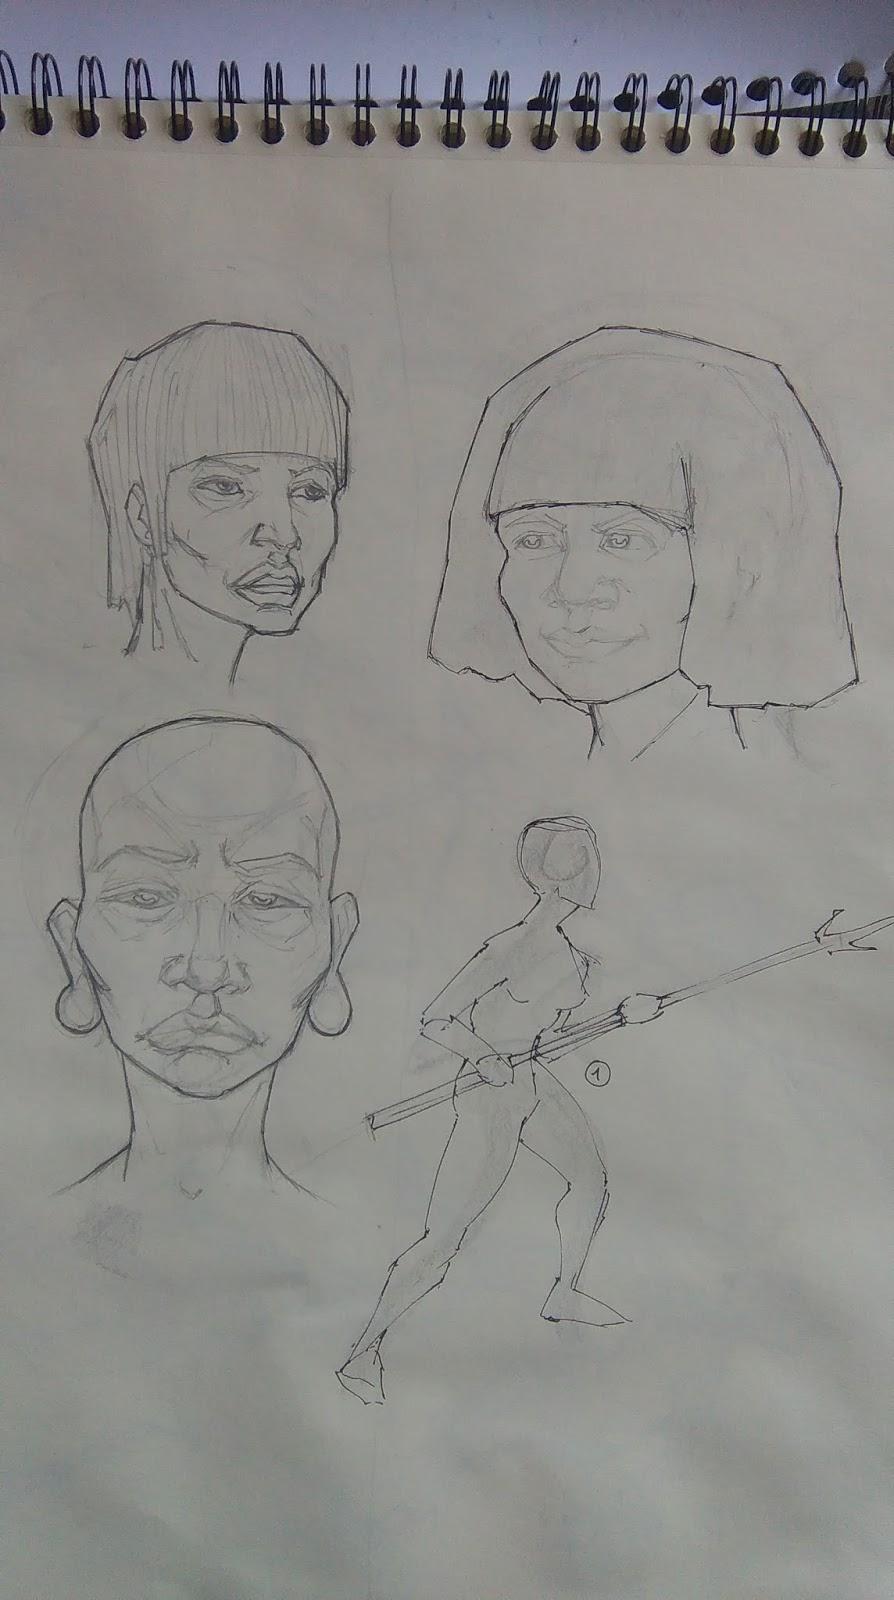 [SPOLYK] - Geometries & sketches IMAG0006